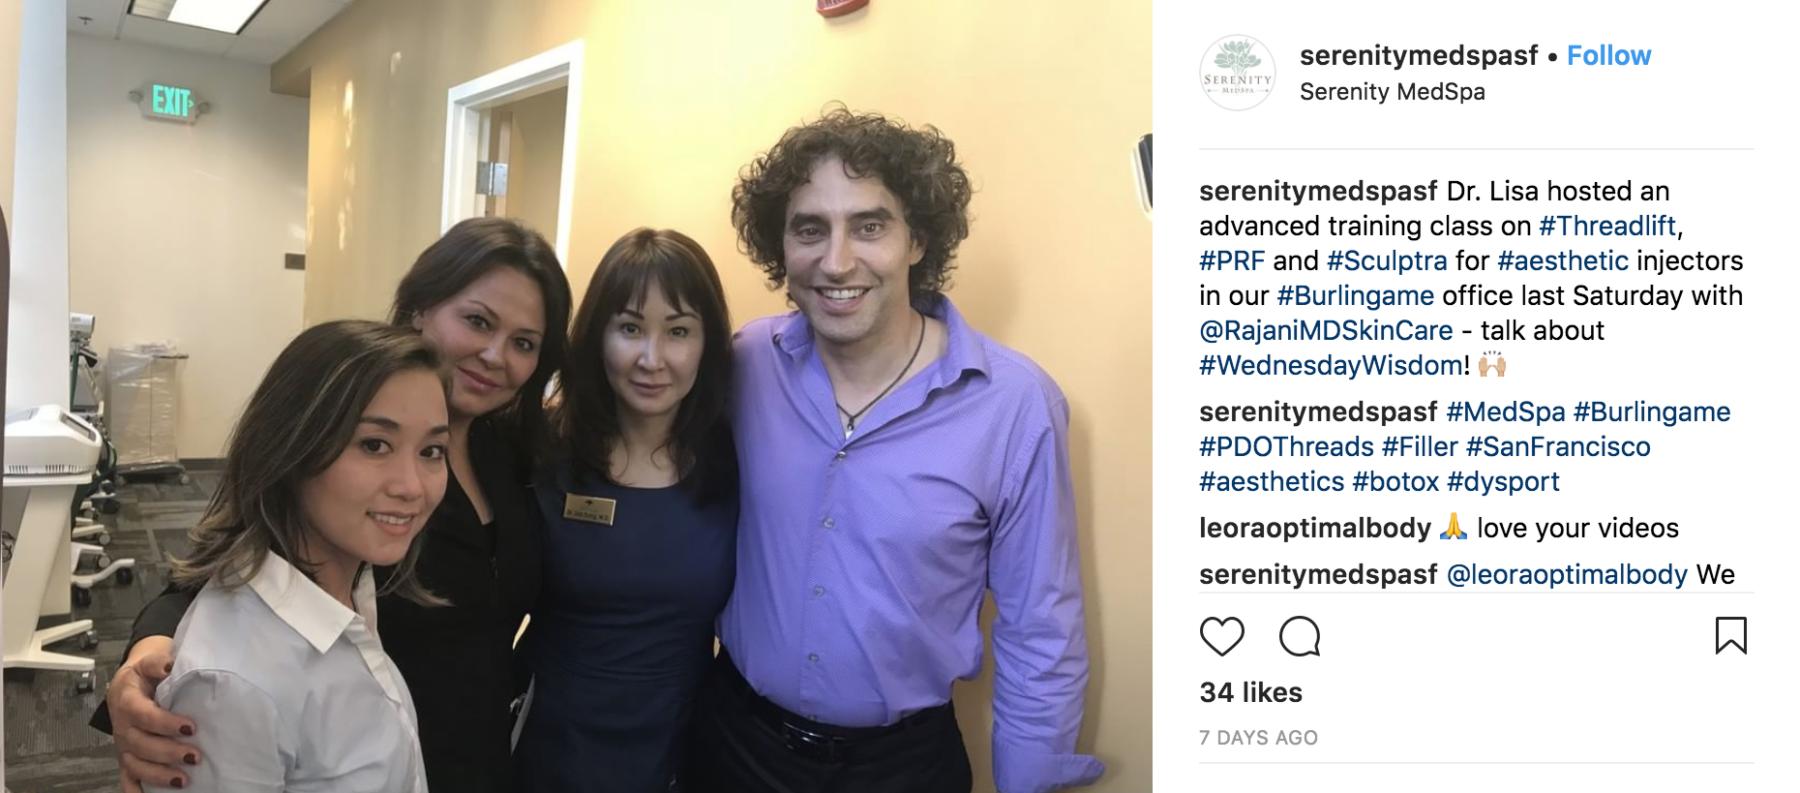 RajaniMD Training At Serenity Med Spa In San Francisco